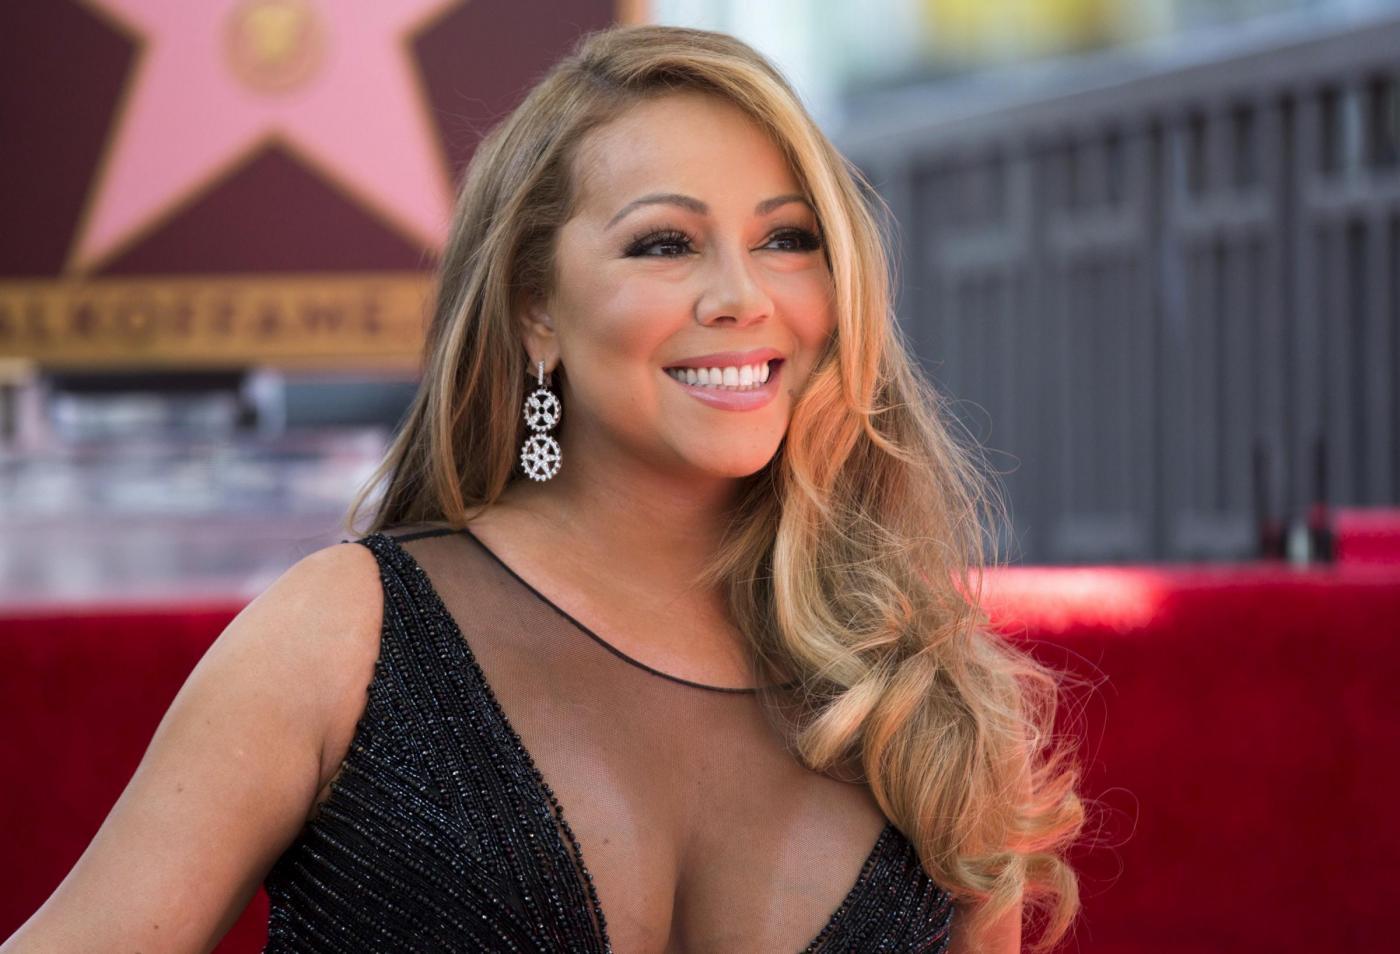 Mariah Carey riceve la stella sulla Hollywood Walk of Fame 14